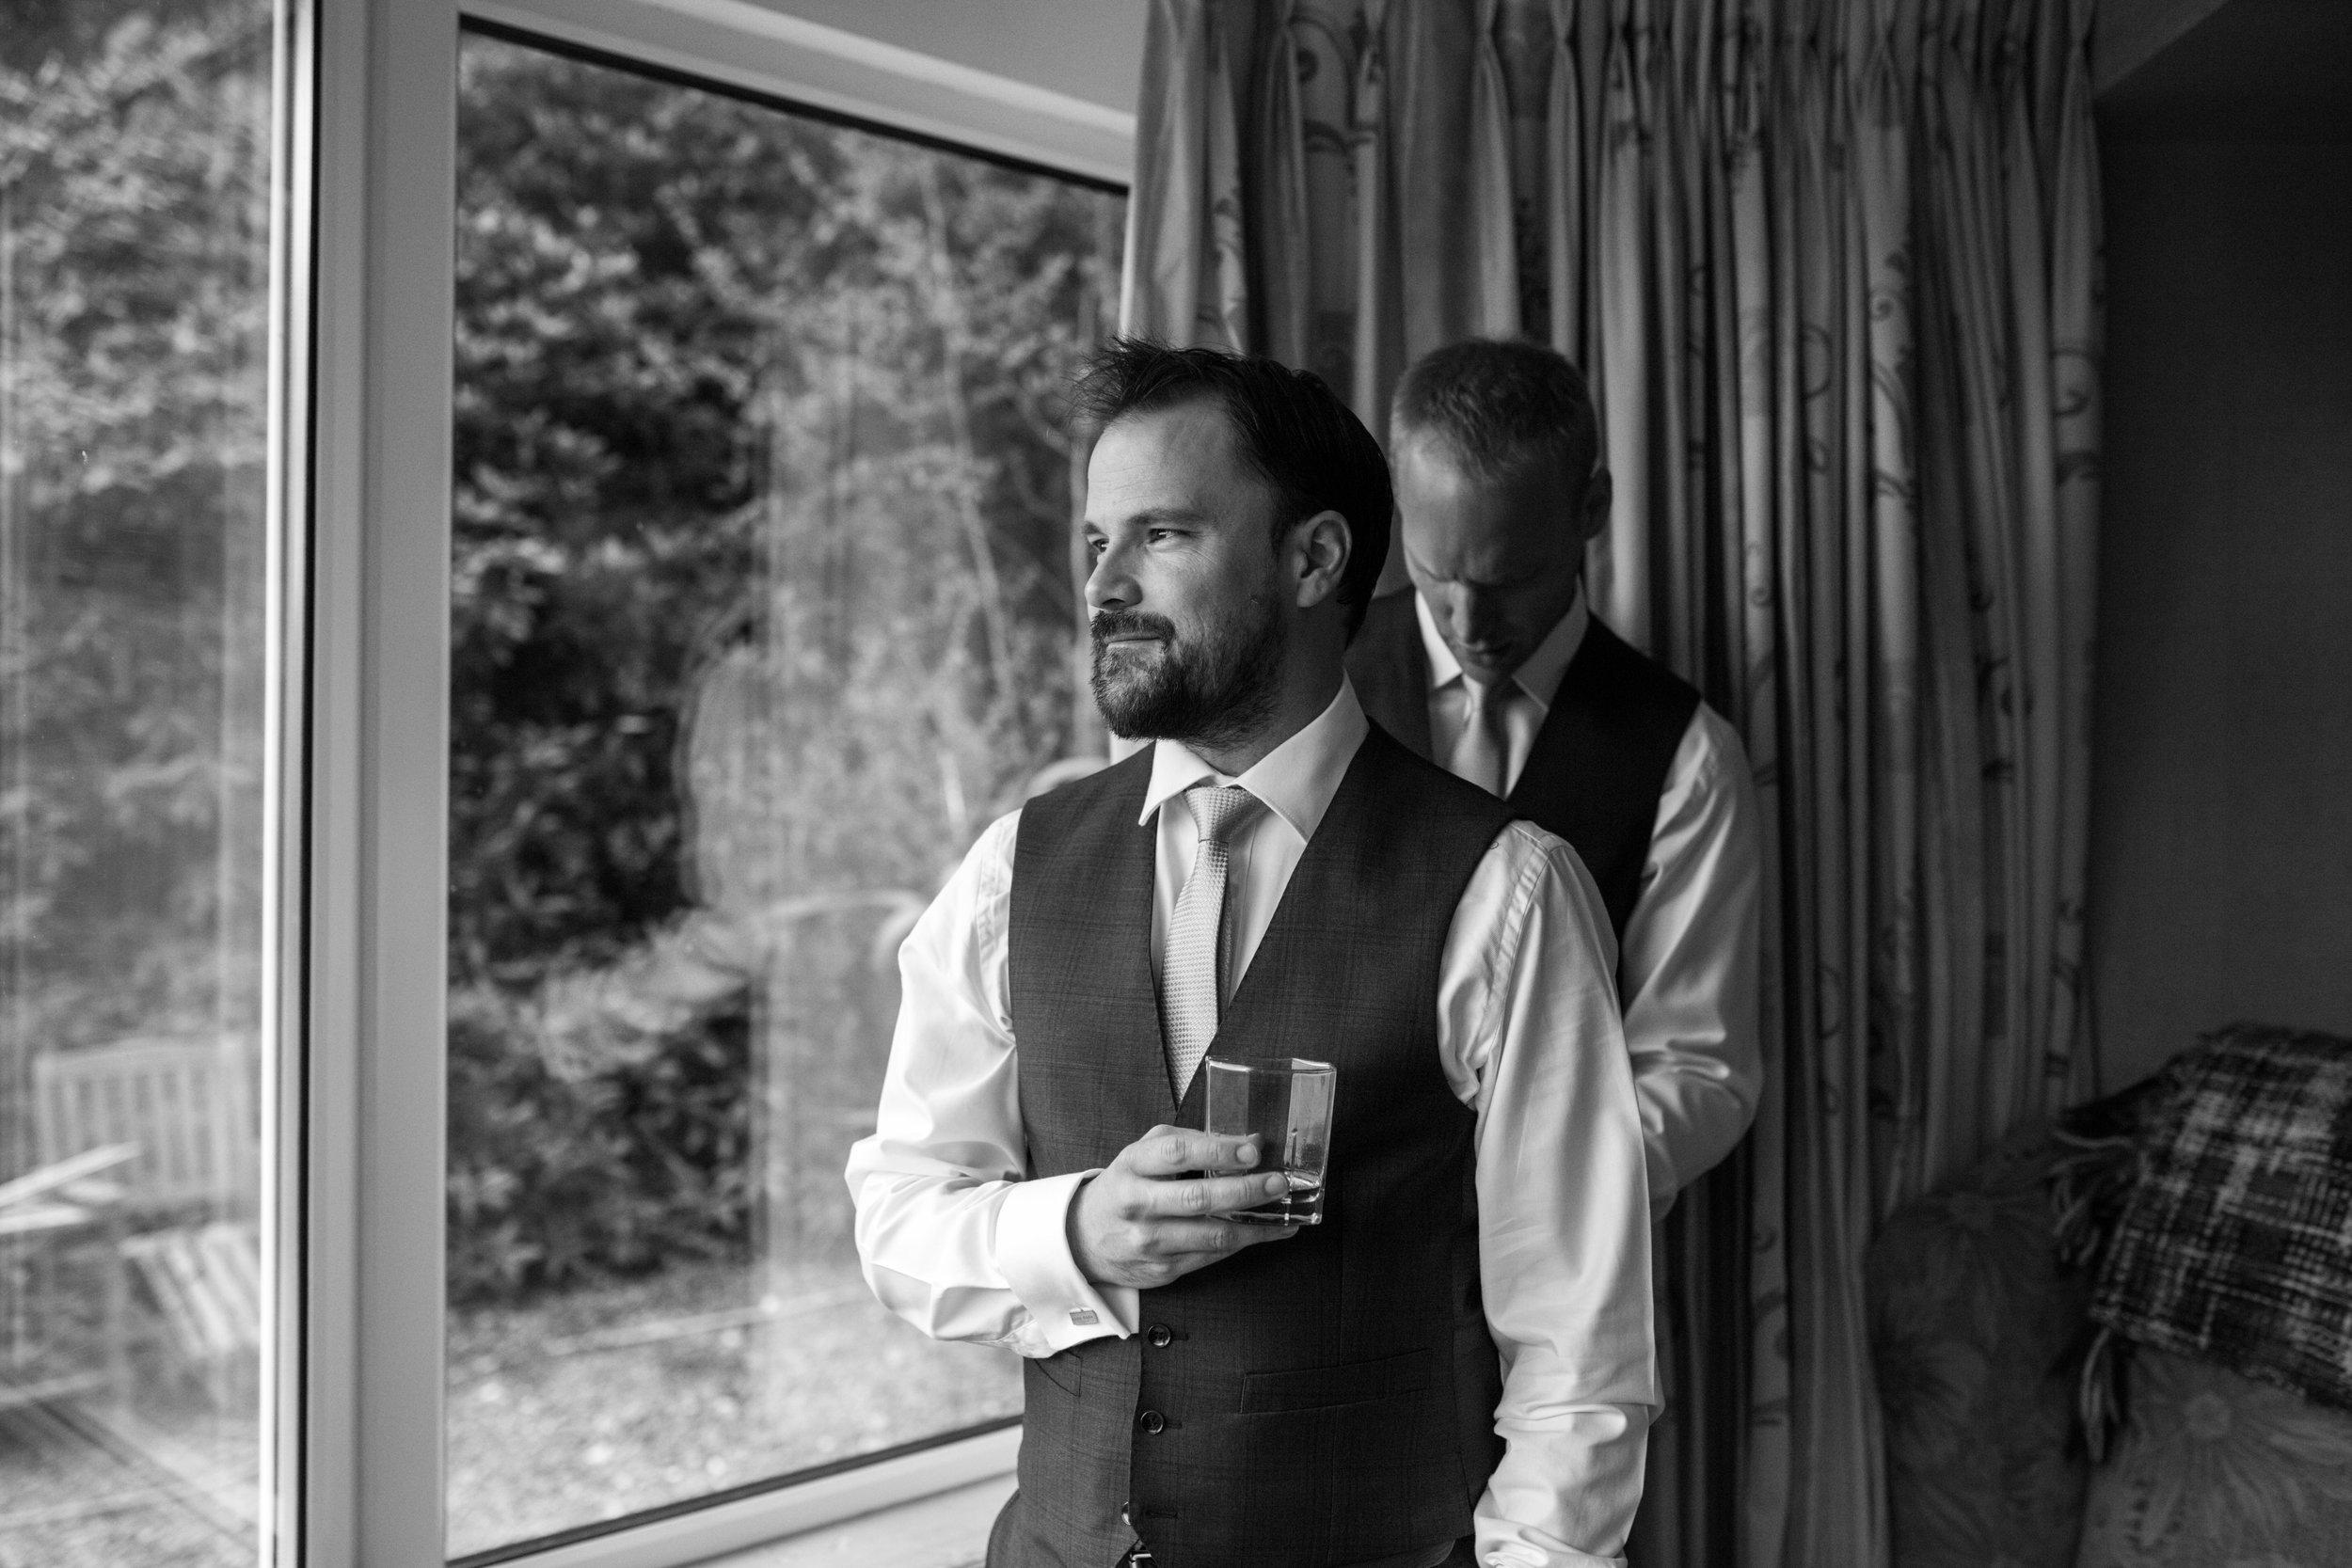 Anna_Mark_Cashel_Connemara_Olivia_Moon_Wedding_Photography-4.jpg